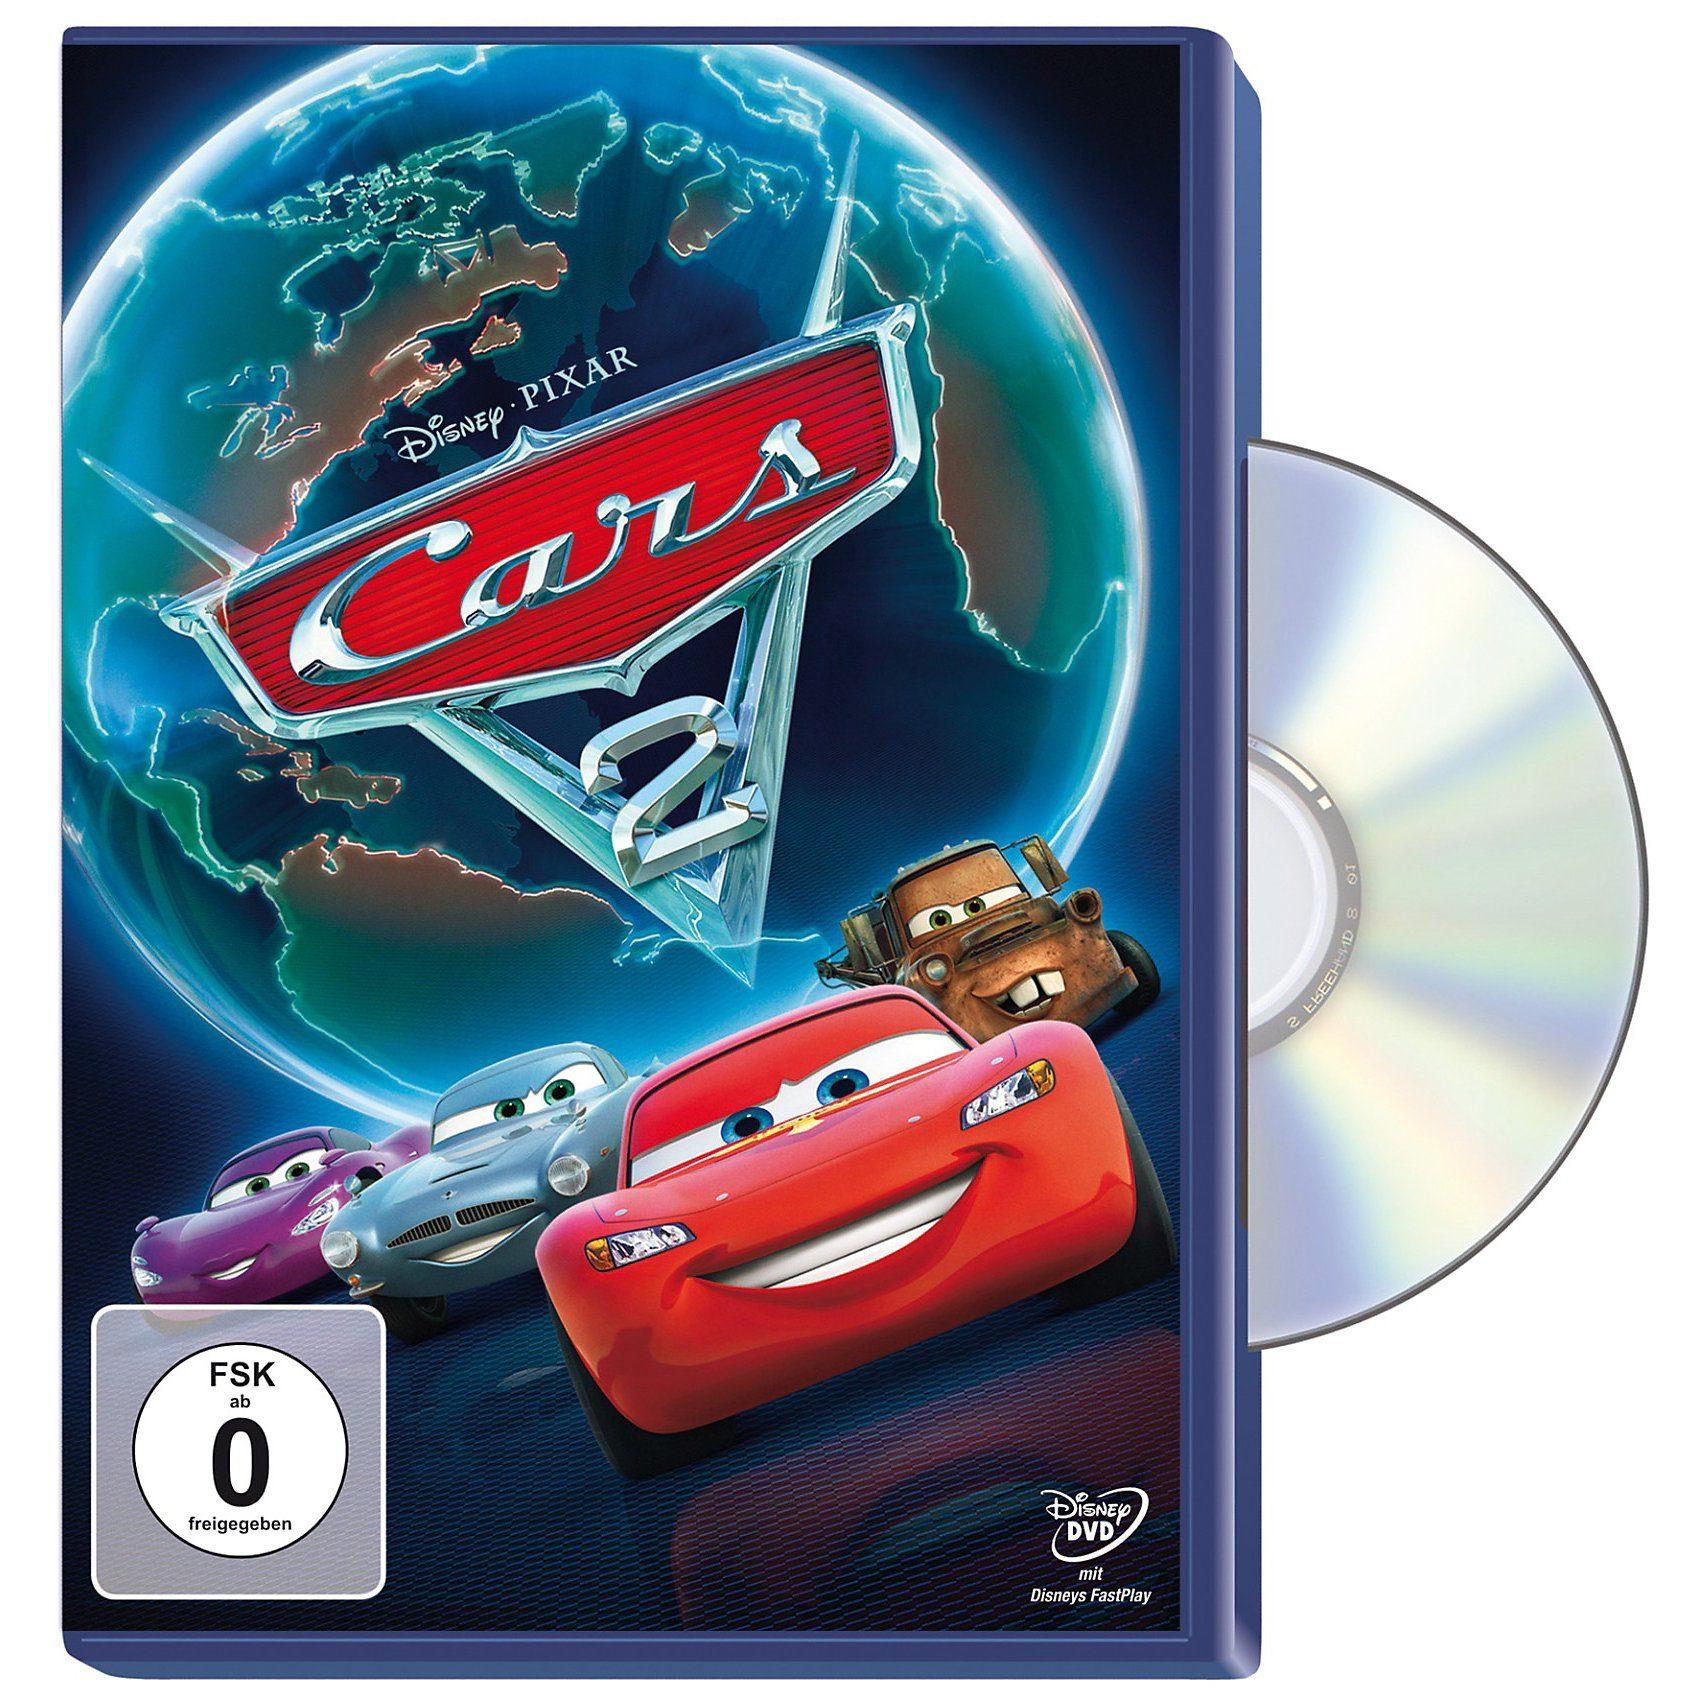 Disney DVD DVD Cars 2